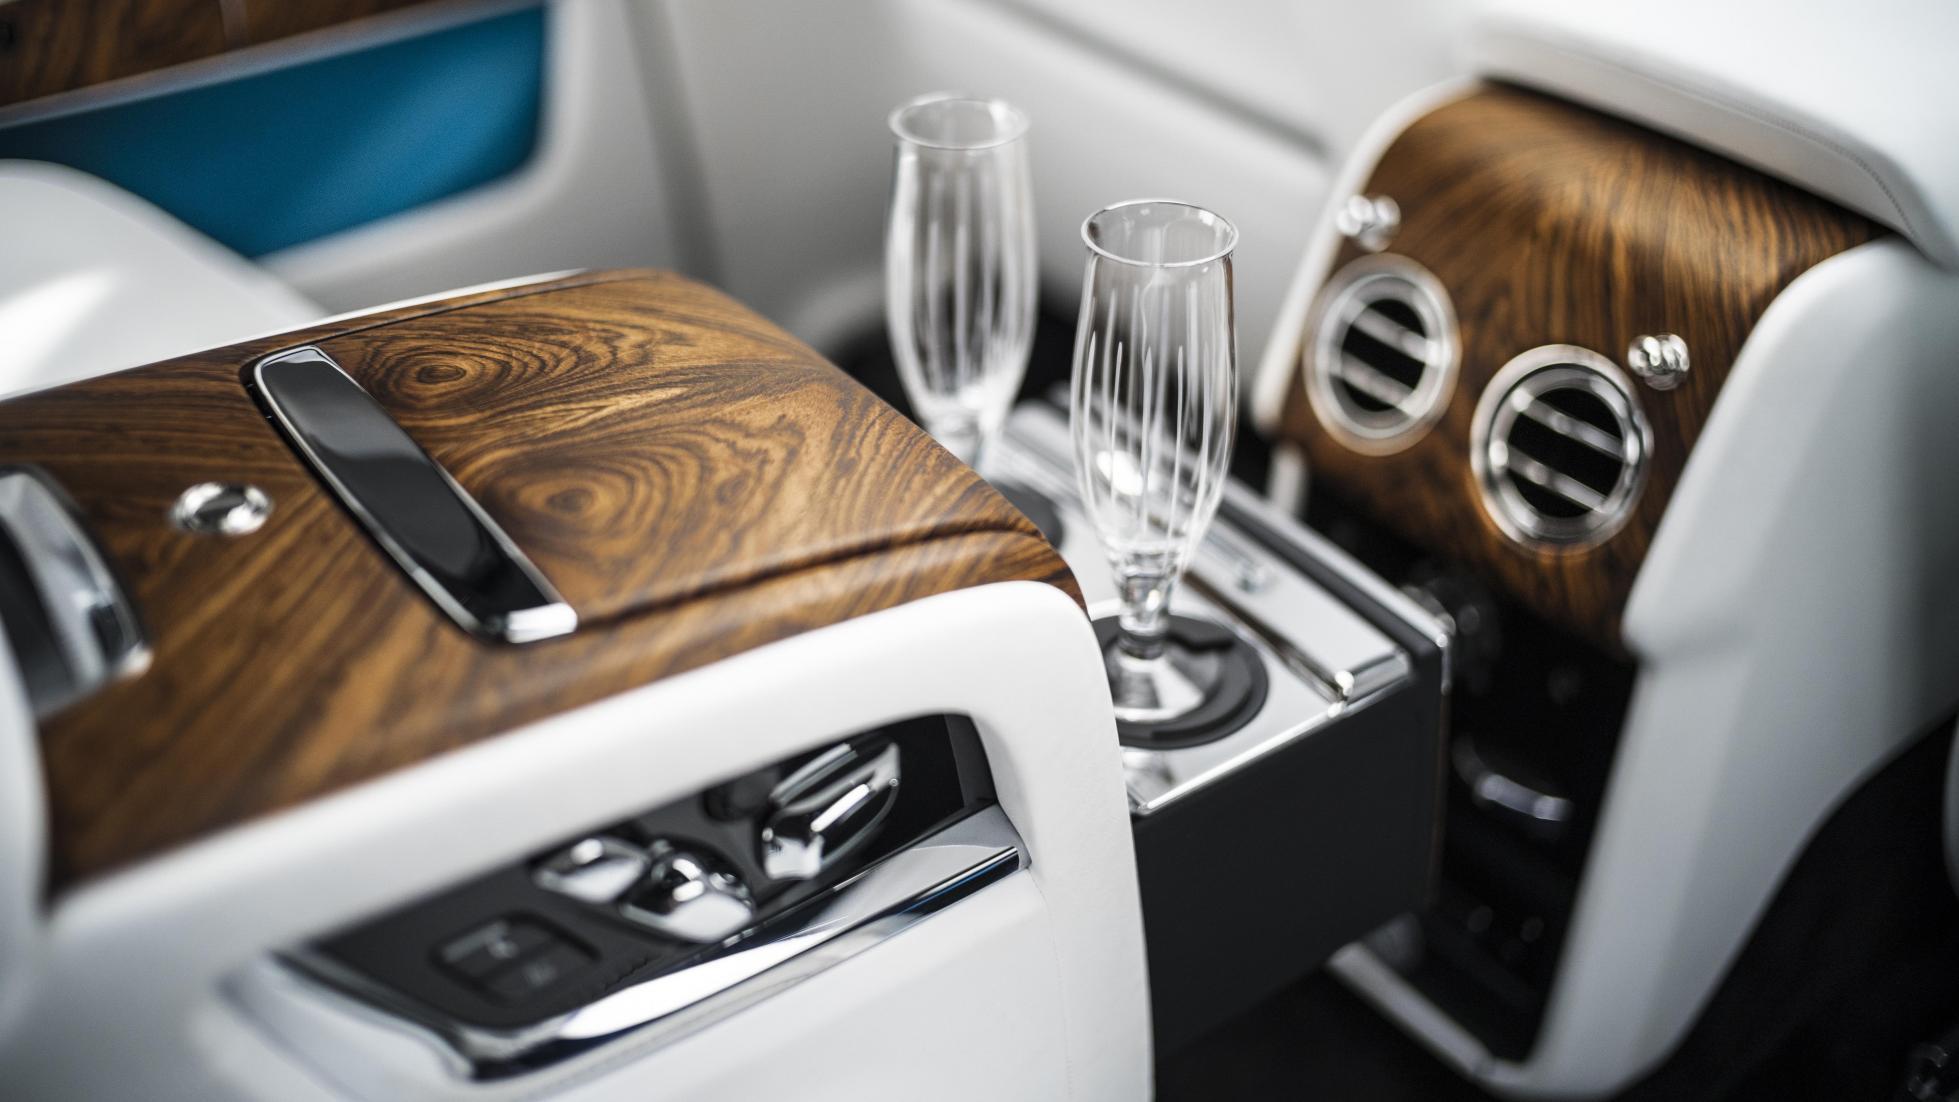 Rolls-Royce Cullinan interieur 1e rij-indruk